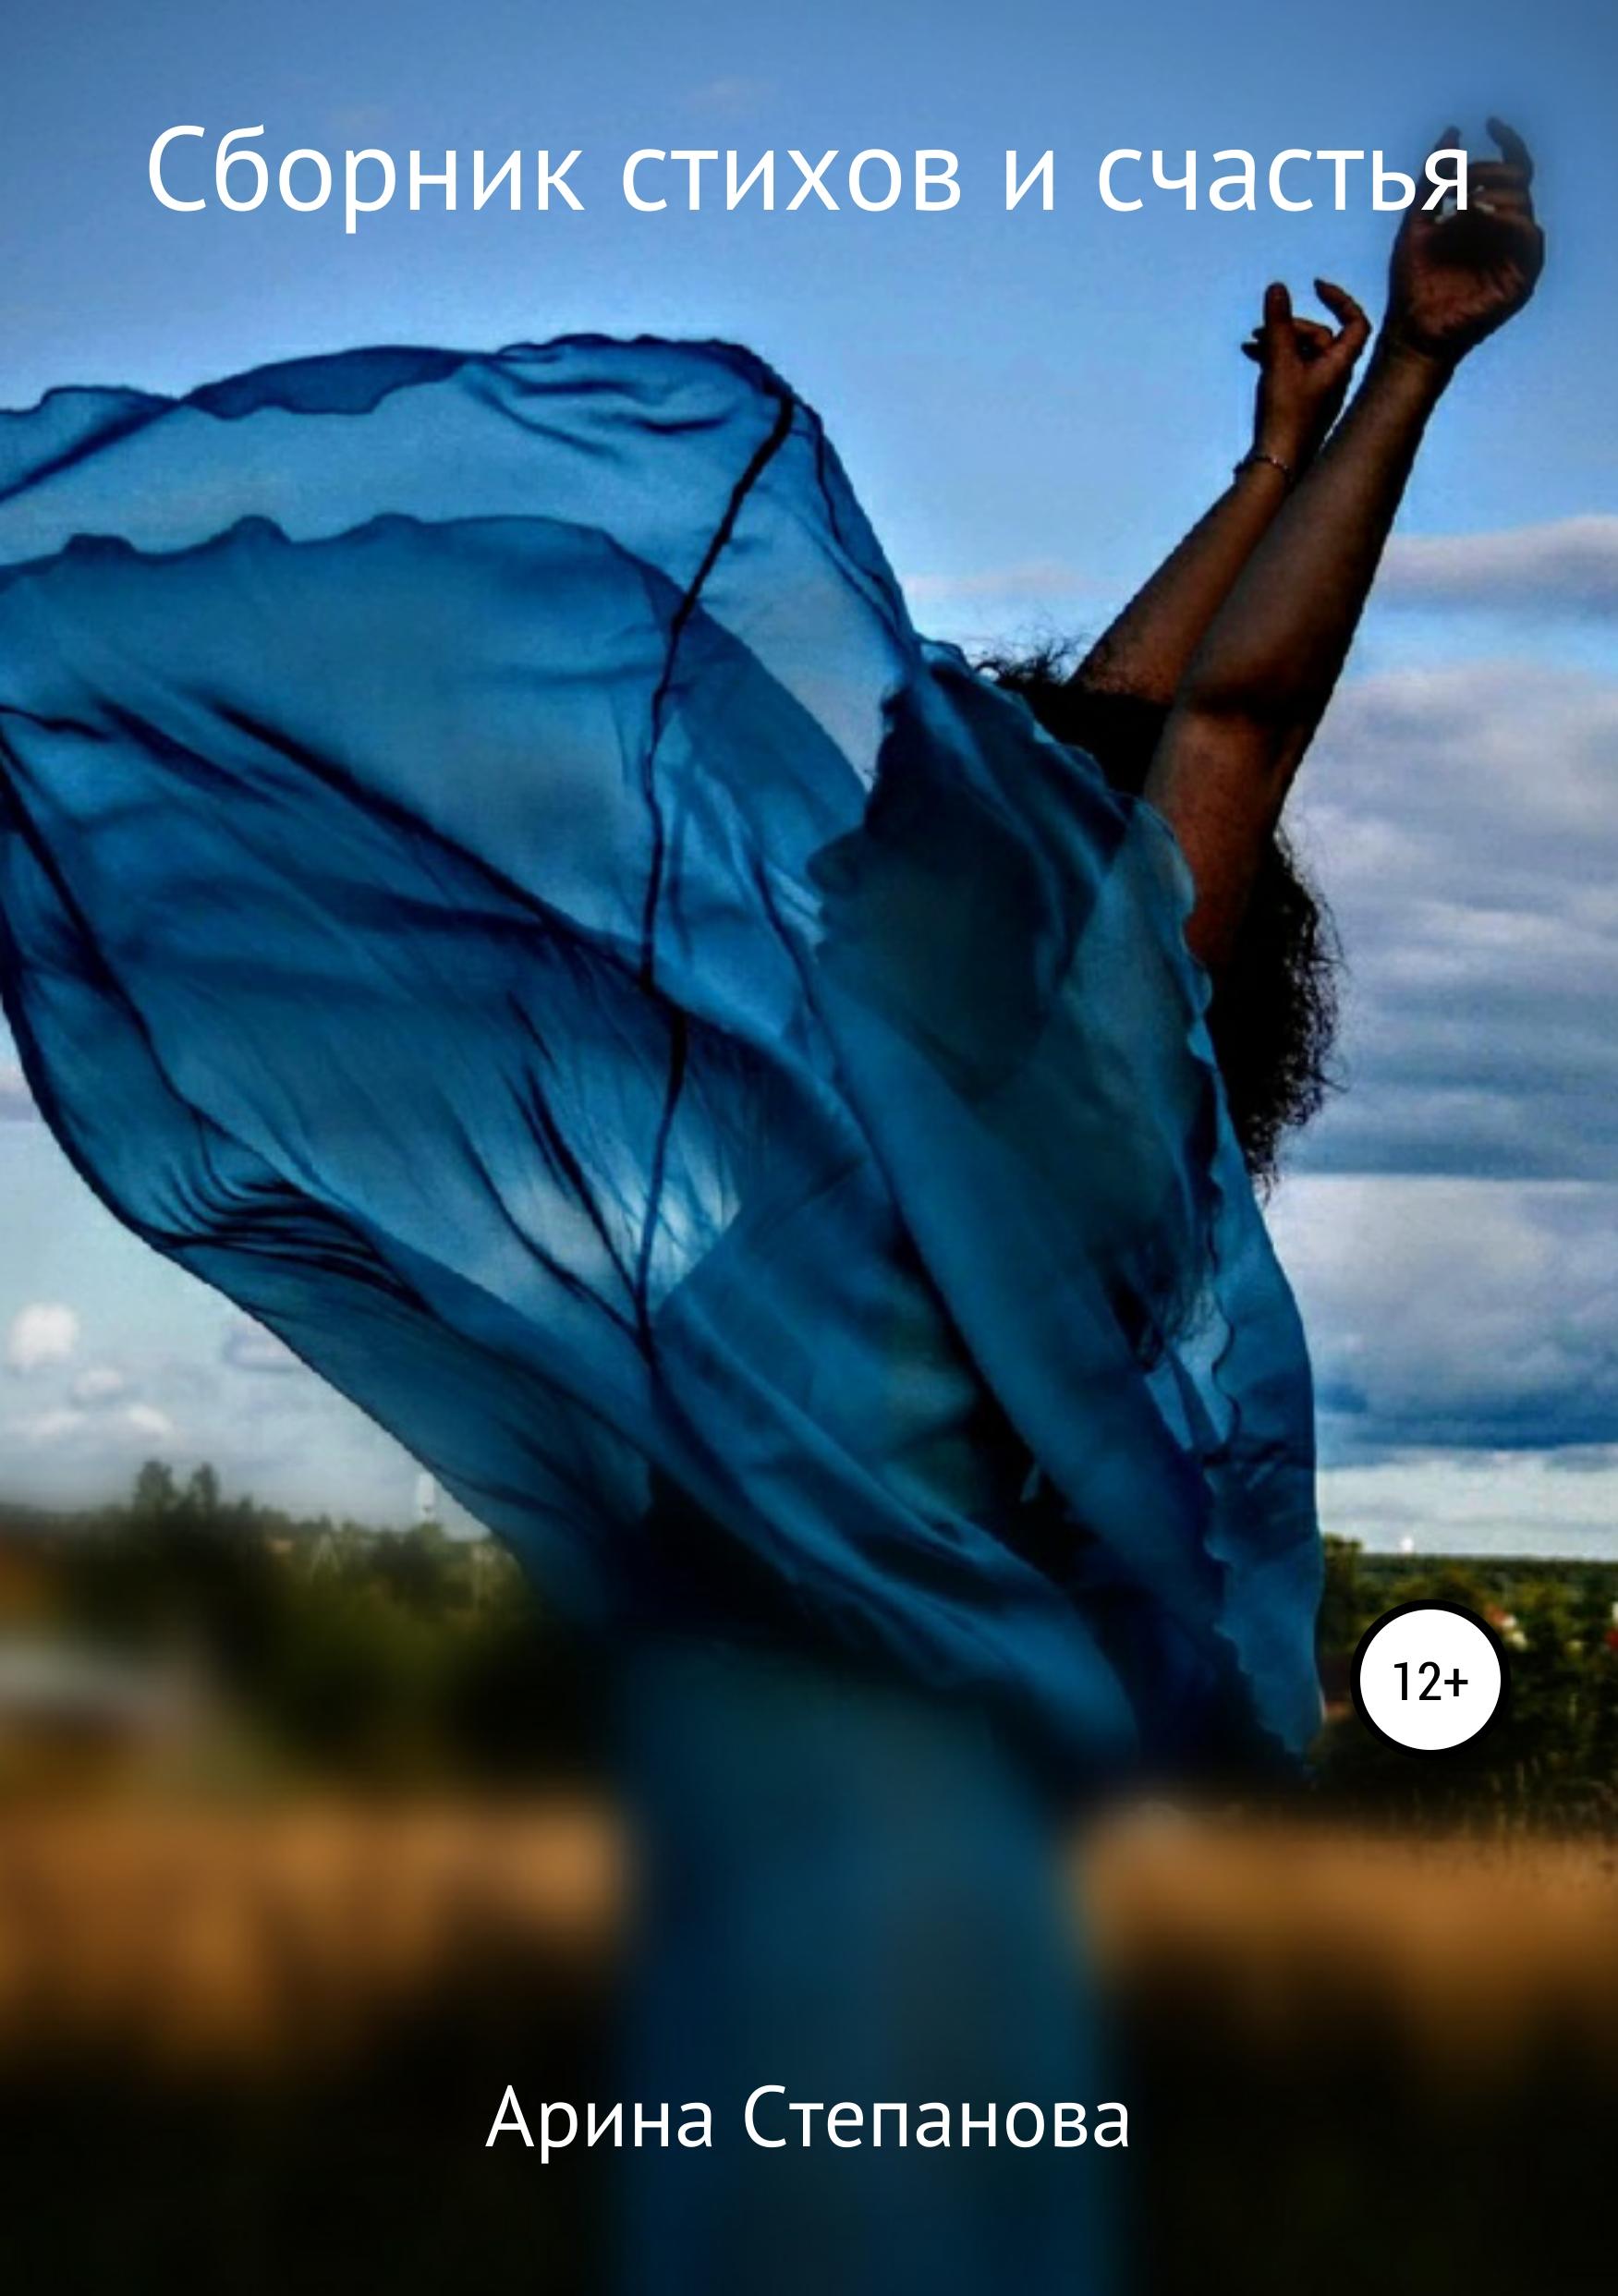 Арина Алексеевна Степанова Сборник стихов и счастья арина алексеевна степанова сборник стихов и счастья